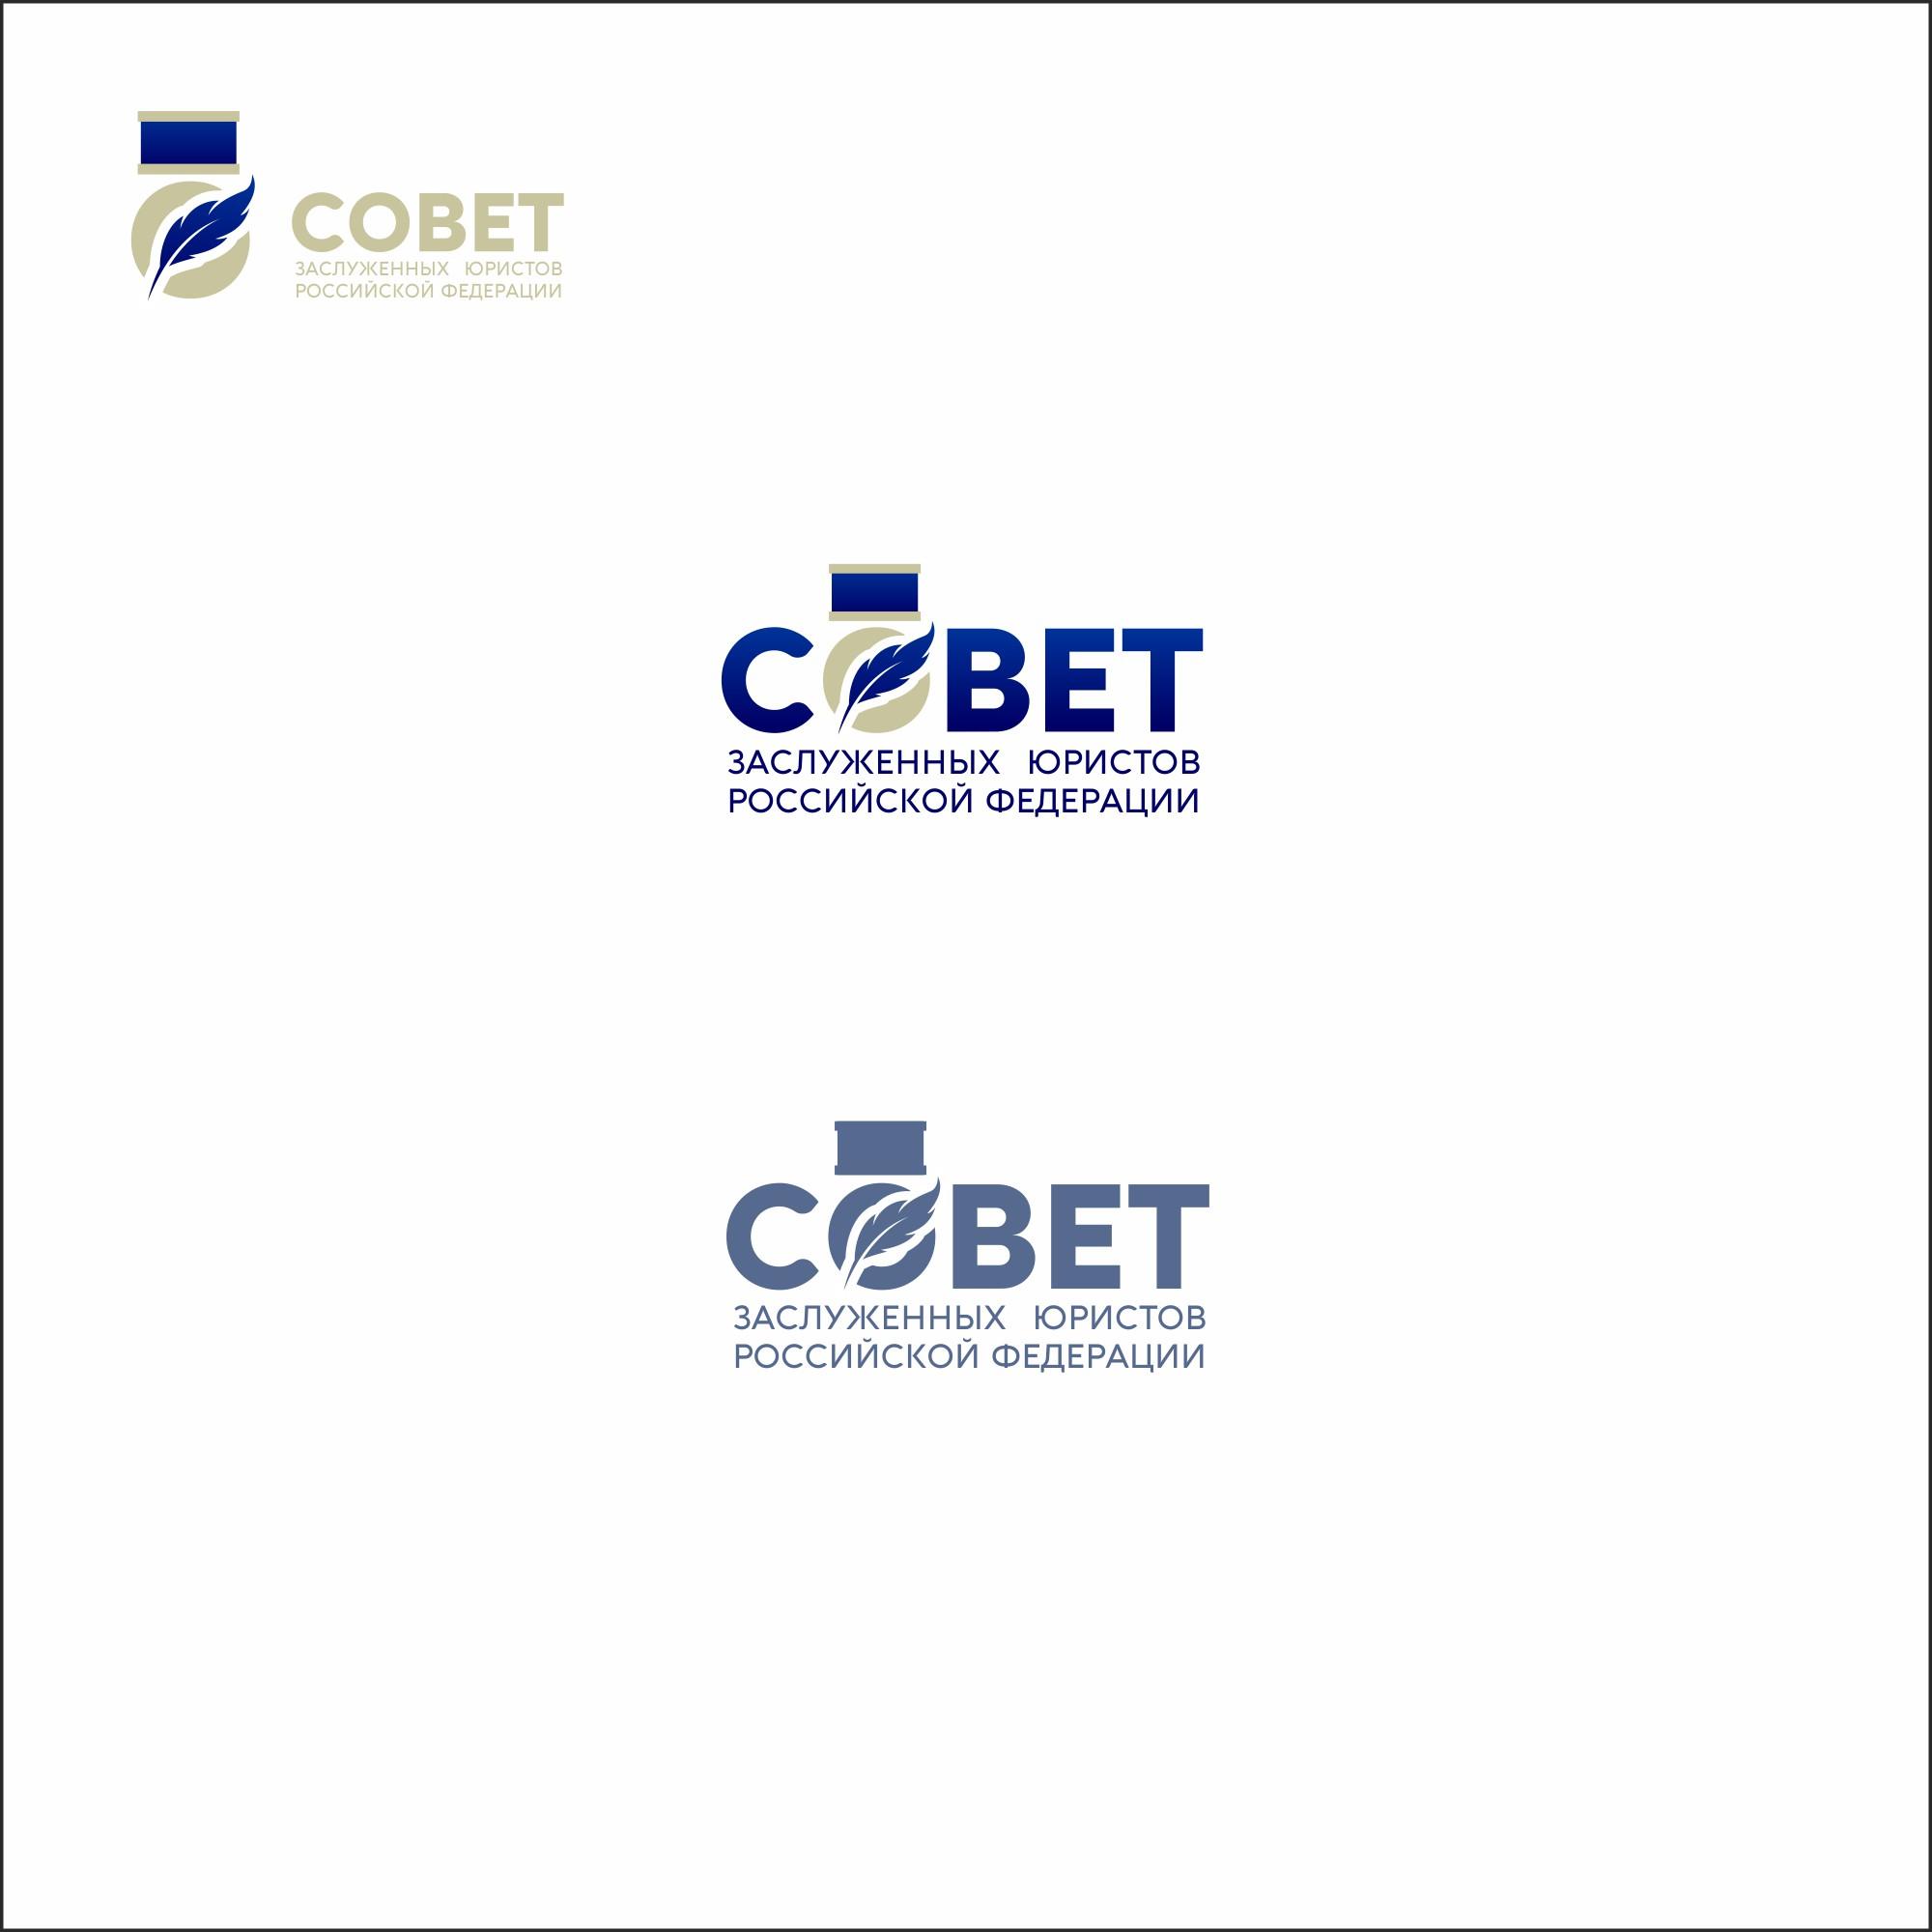 Разработка логотипа Совета (Клуба) заслуженных юристов Российской Федерации фото f_4125e3d6ac5a600d.jpg